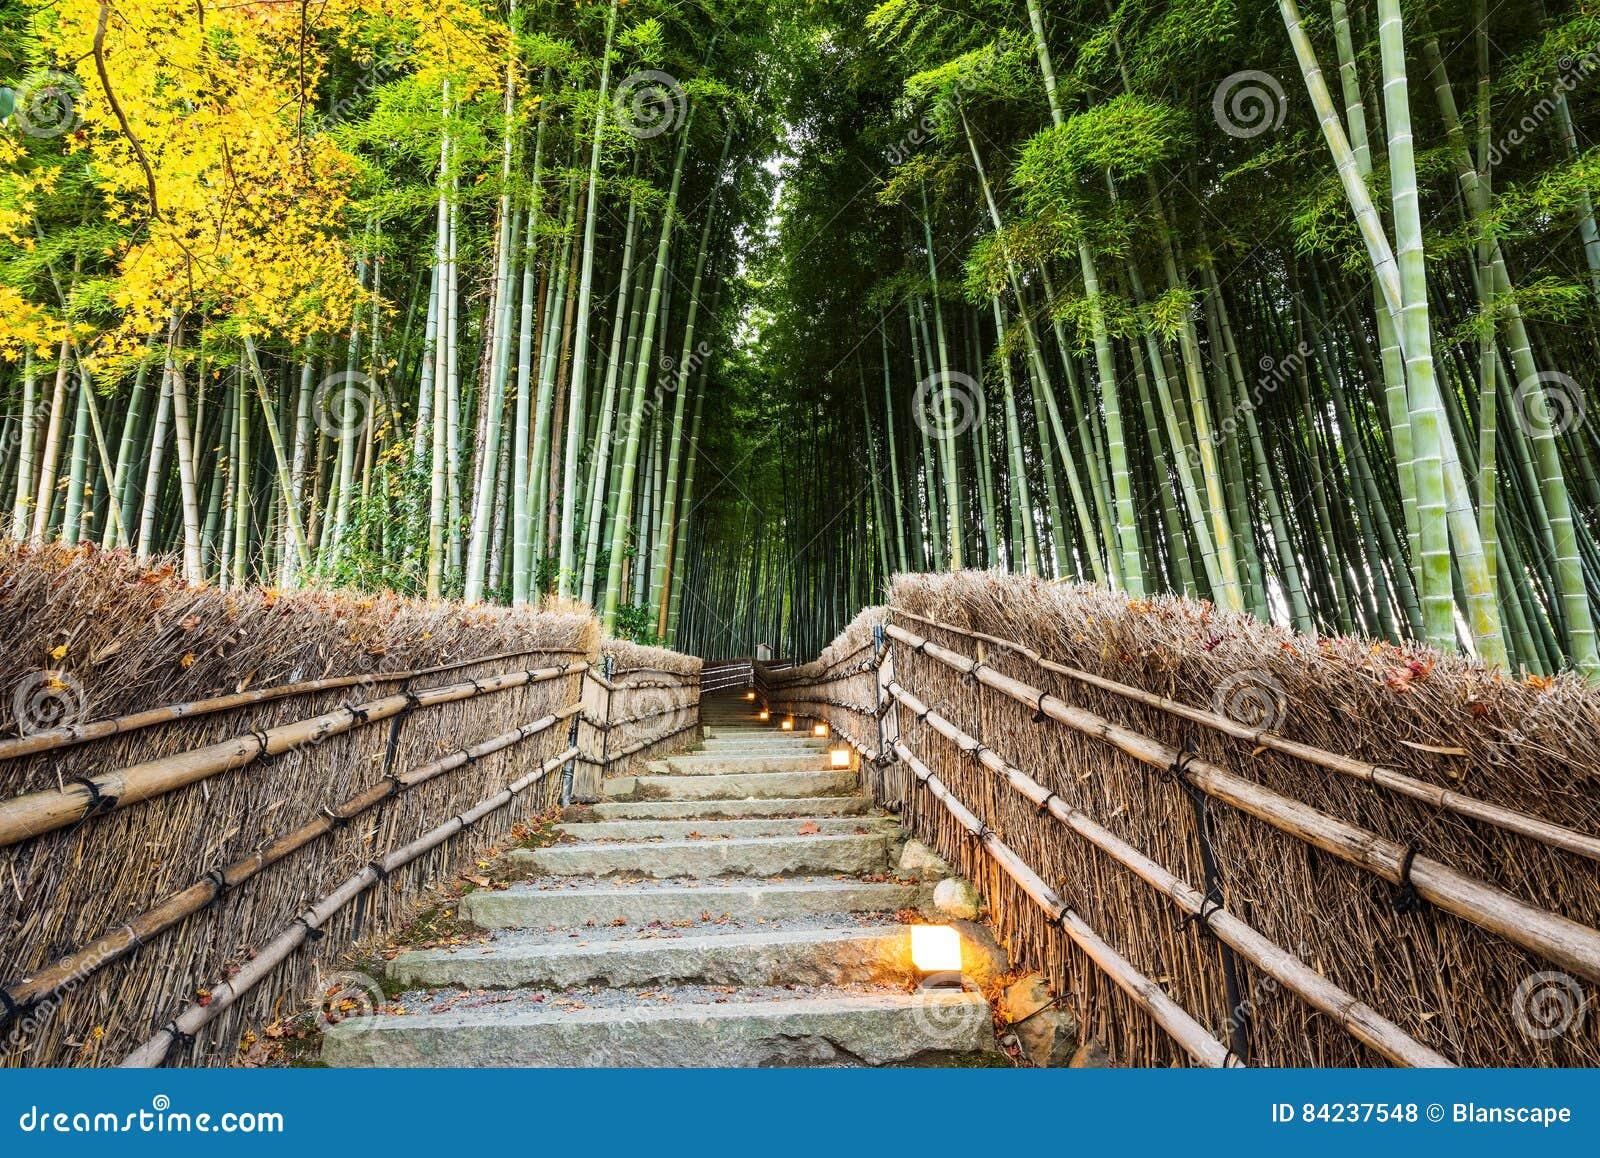 Trayectoria de bosque de bambú de Arashiyama, Kyoto